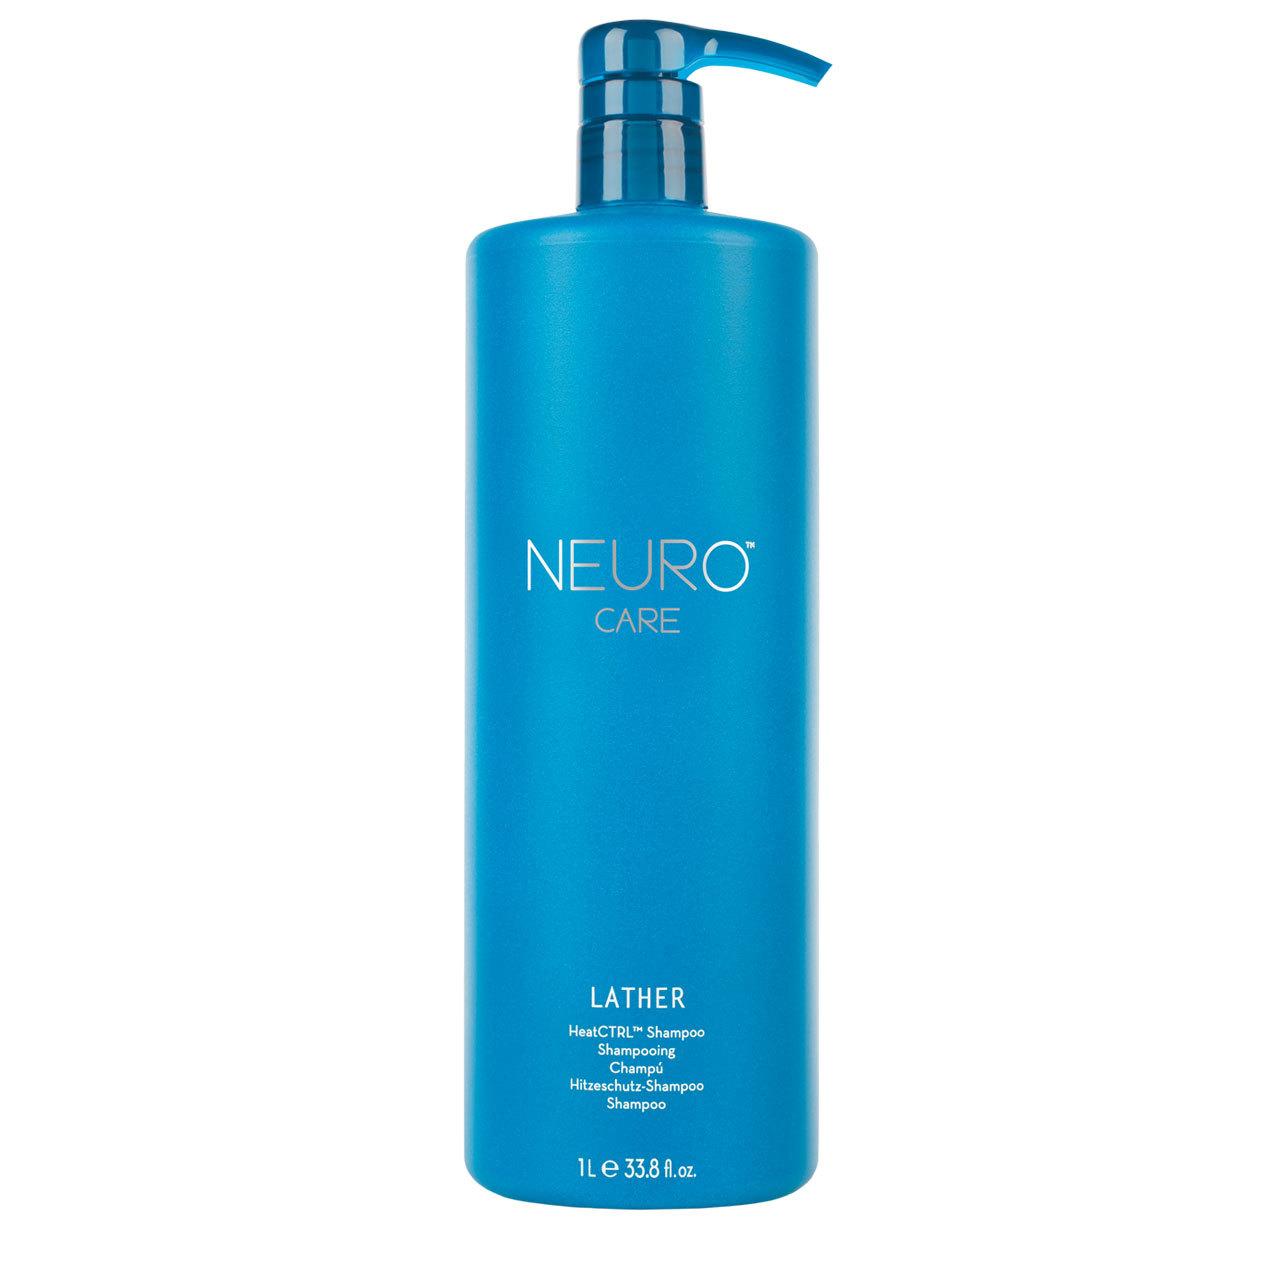 Lather HeatCTRL Shampoo 33.8oz Paul Mitchell Neuro Liquid